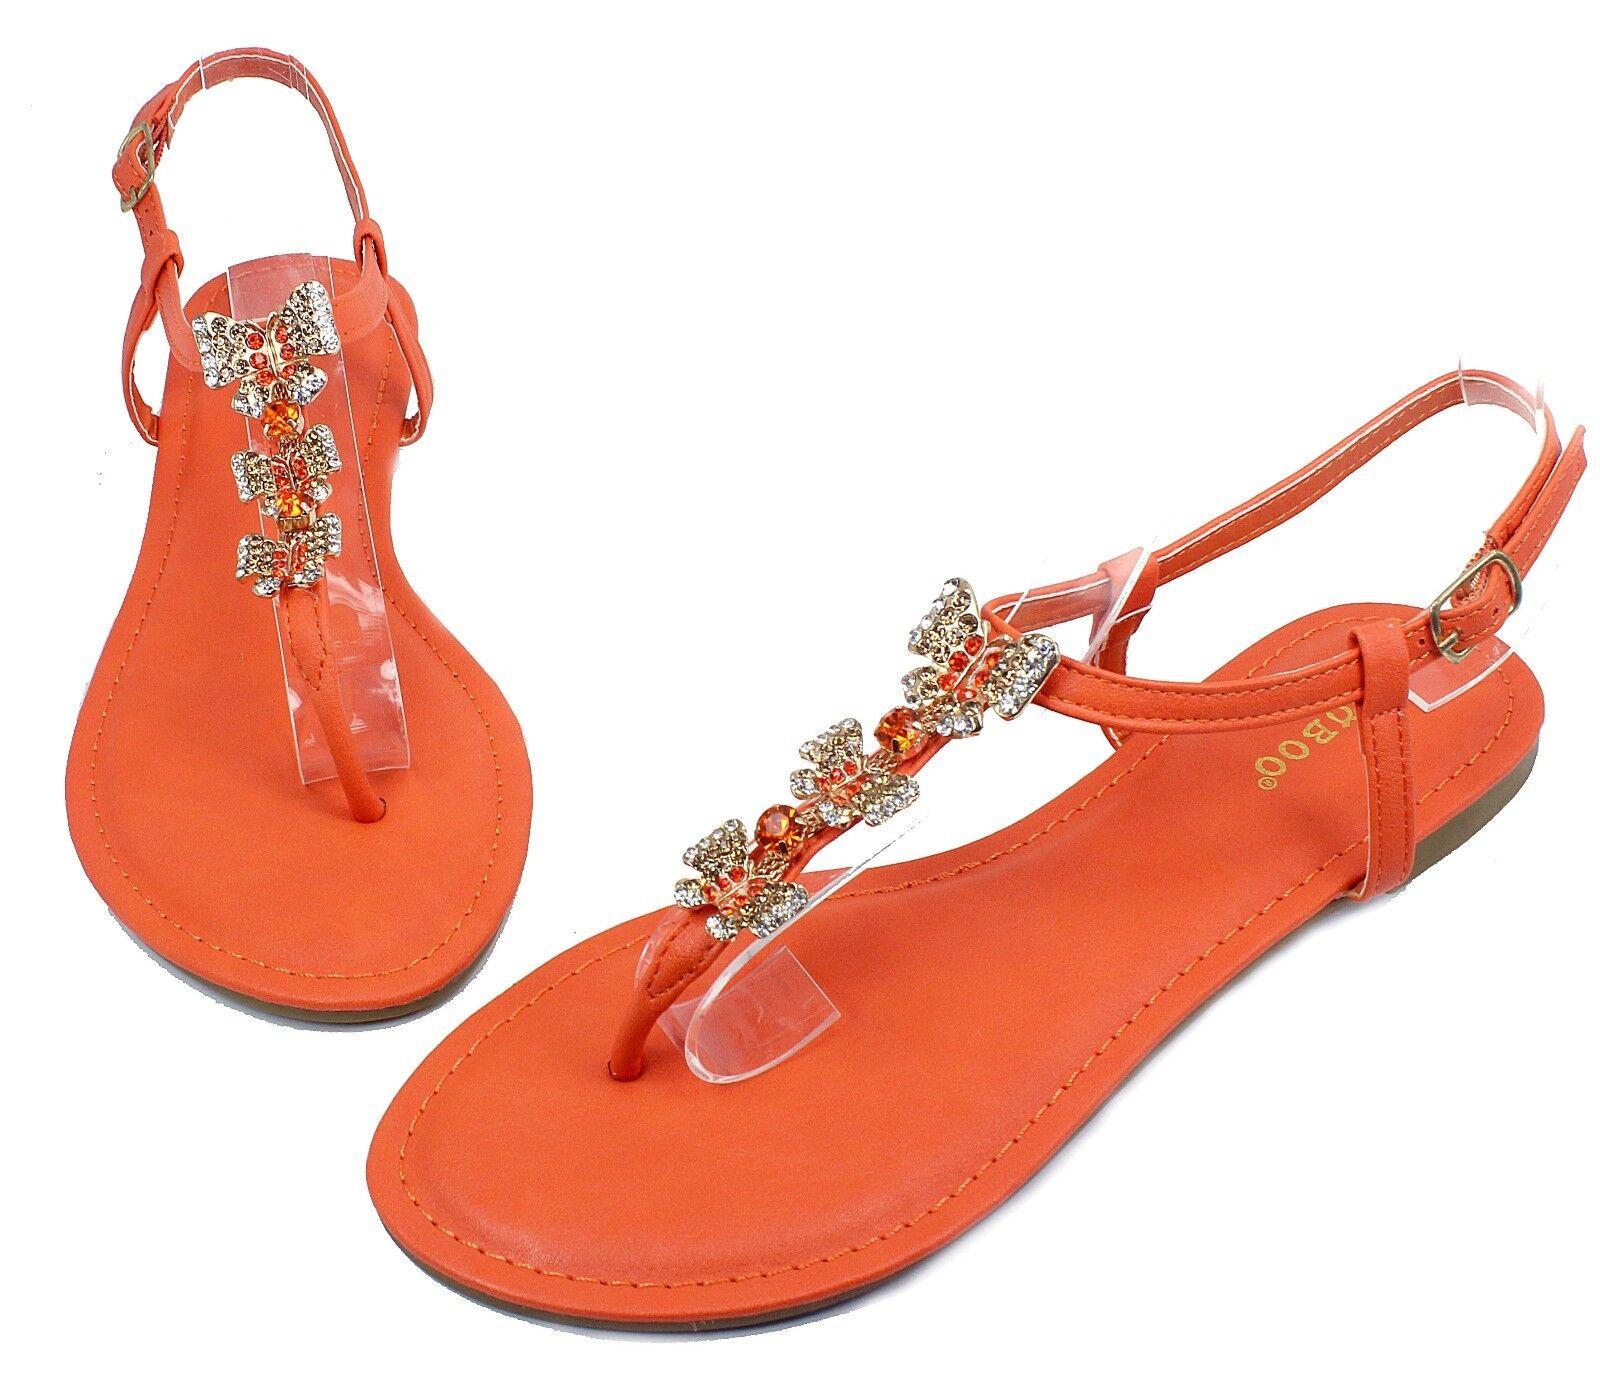 Grayson-17 Fashion Butterfly Stone Orange Flat Sandals Party Women Shoes Orange Stone 7.5 3e3383